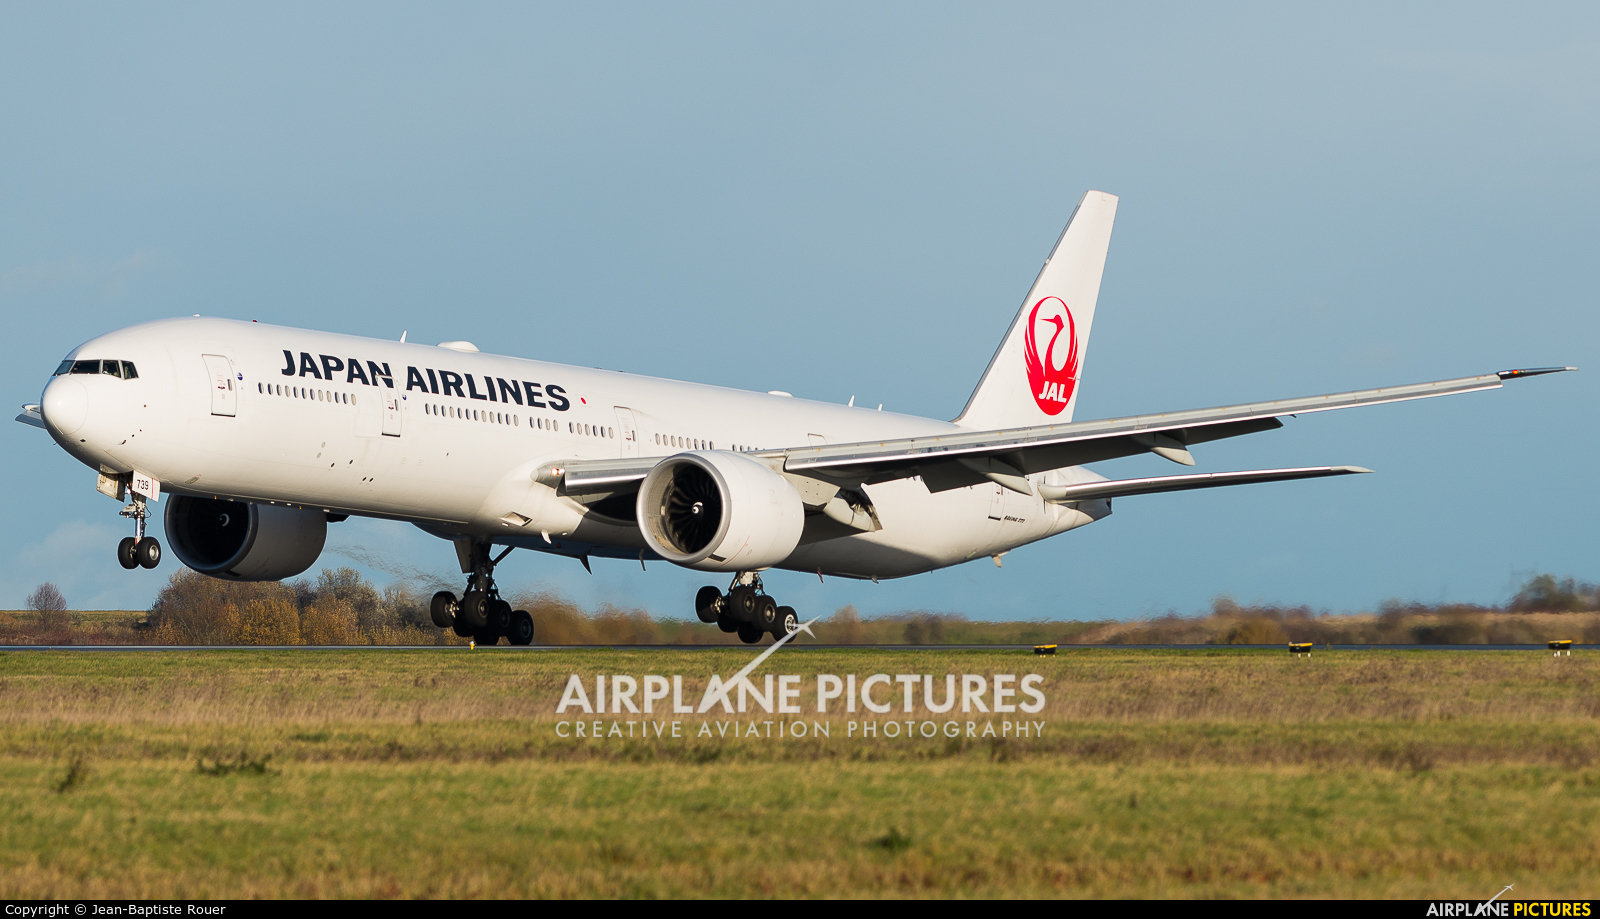 JAL - Japan Airlines JA739J aircraft at Paris - Charles de Gaulle